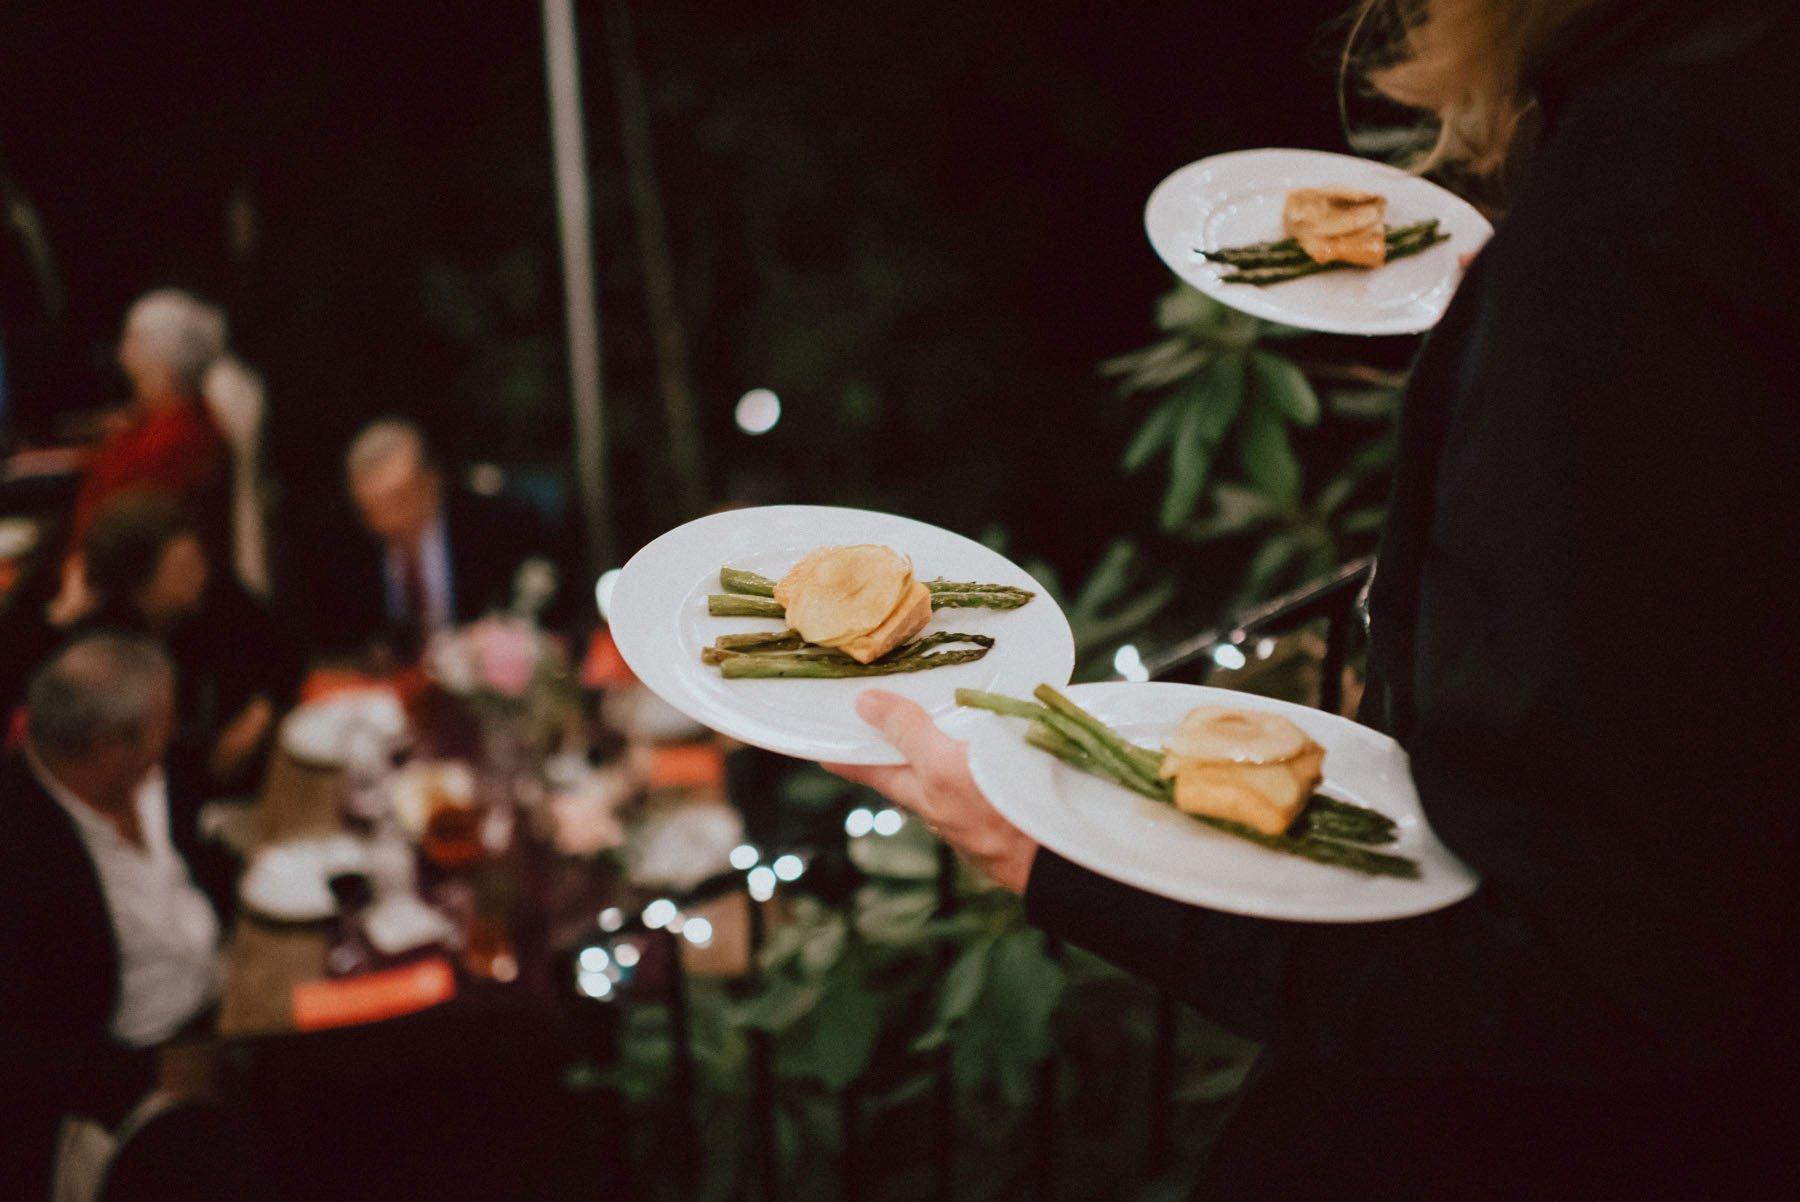 faunbrook-bed-and-breakfast-wedding-162.jpg